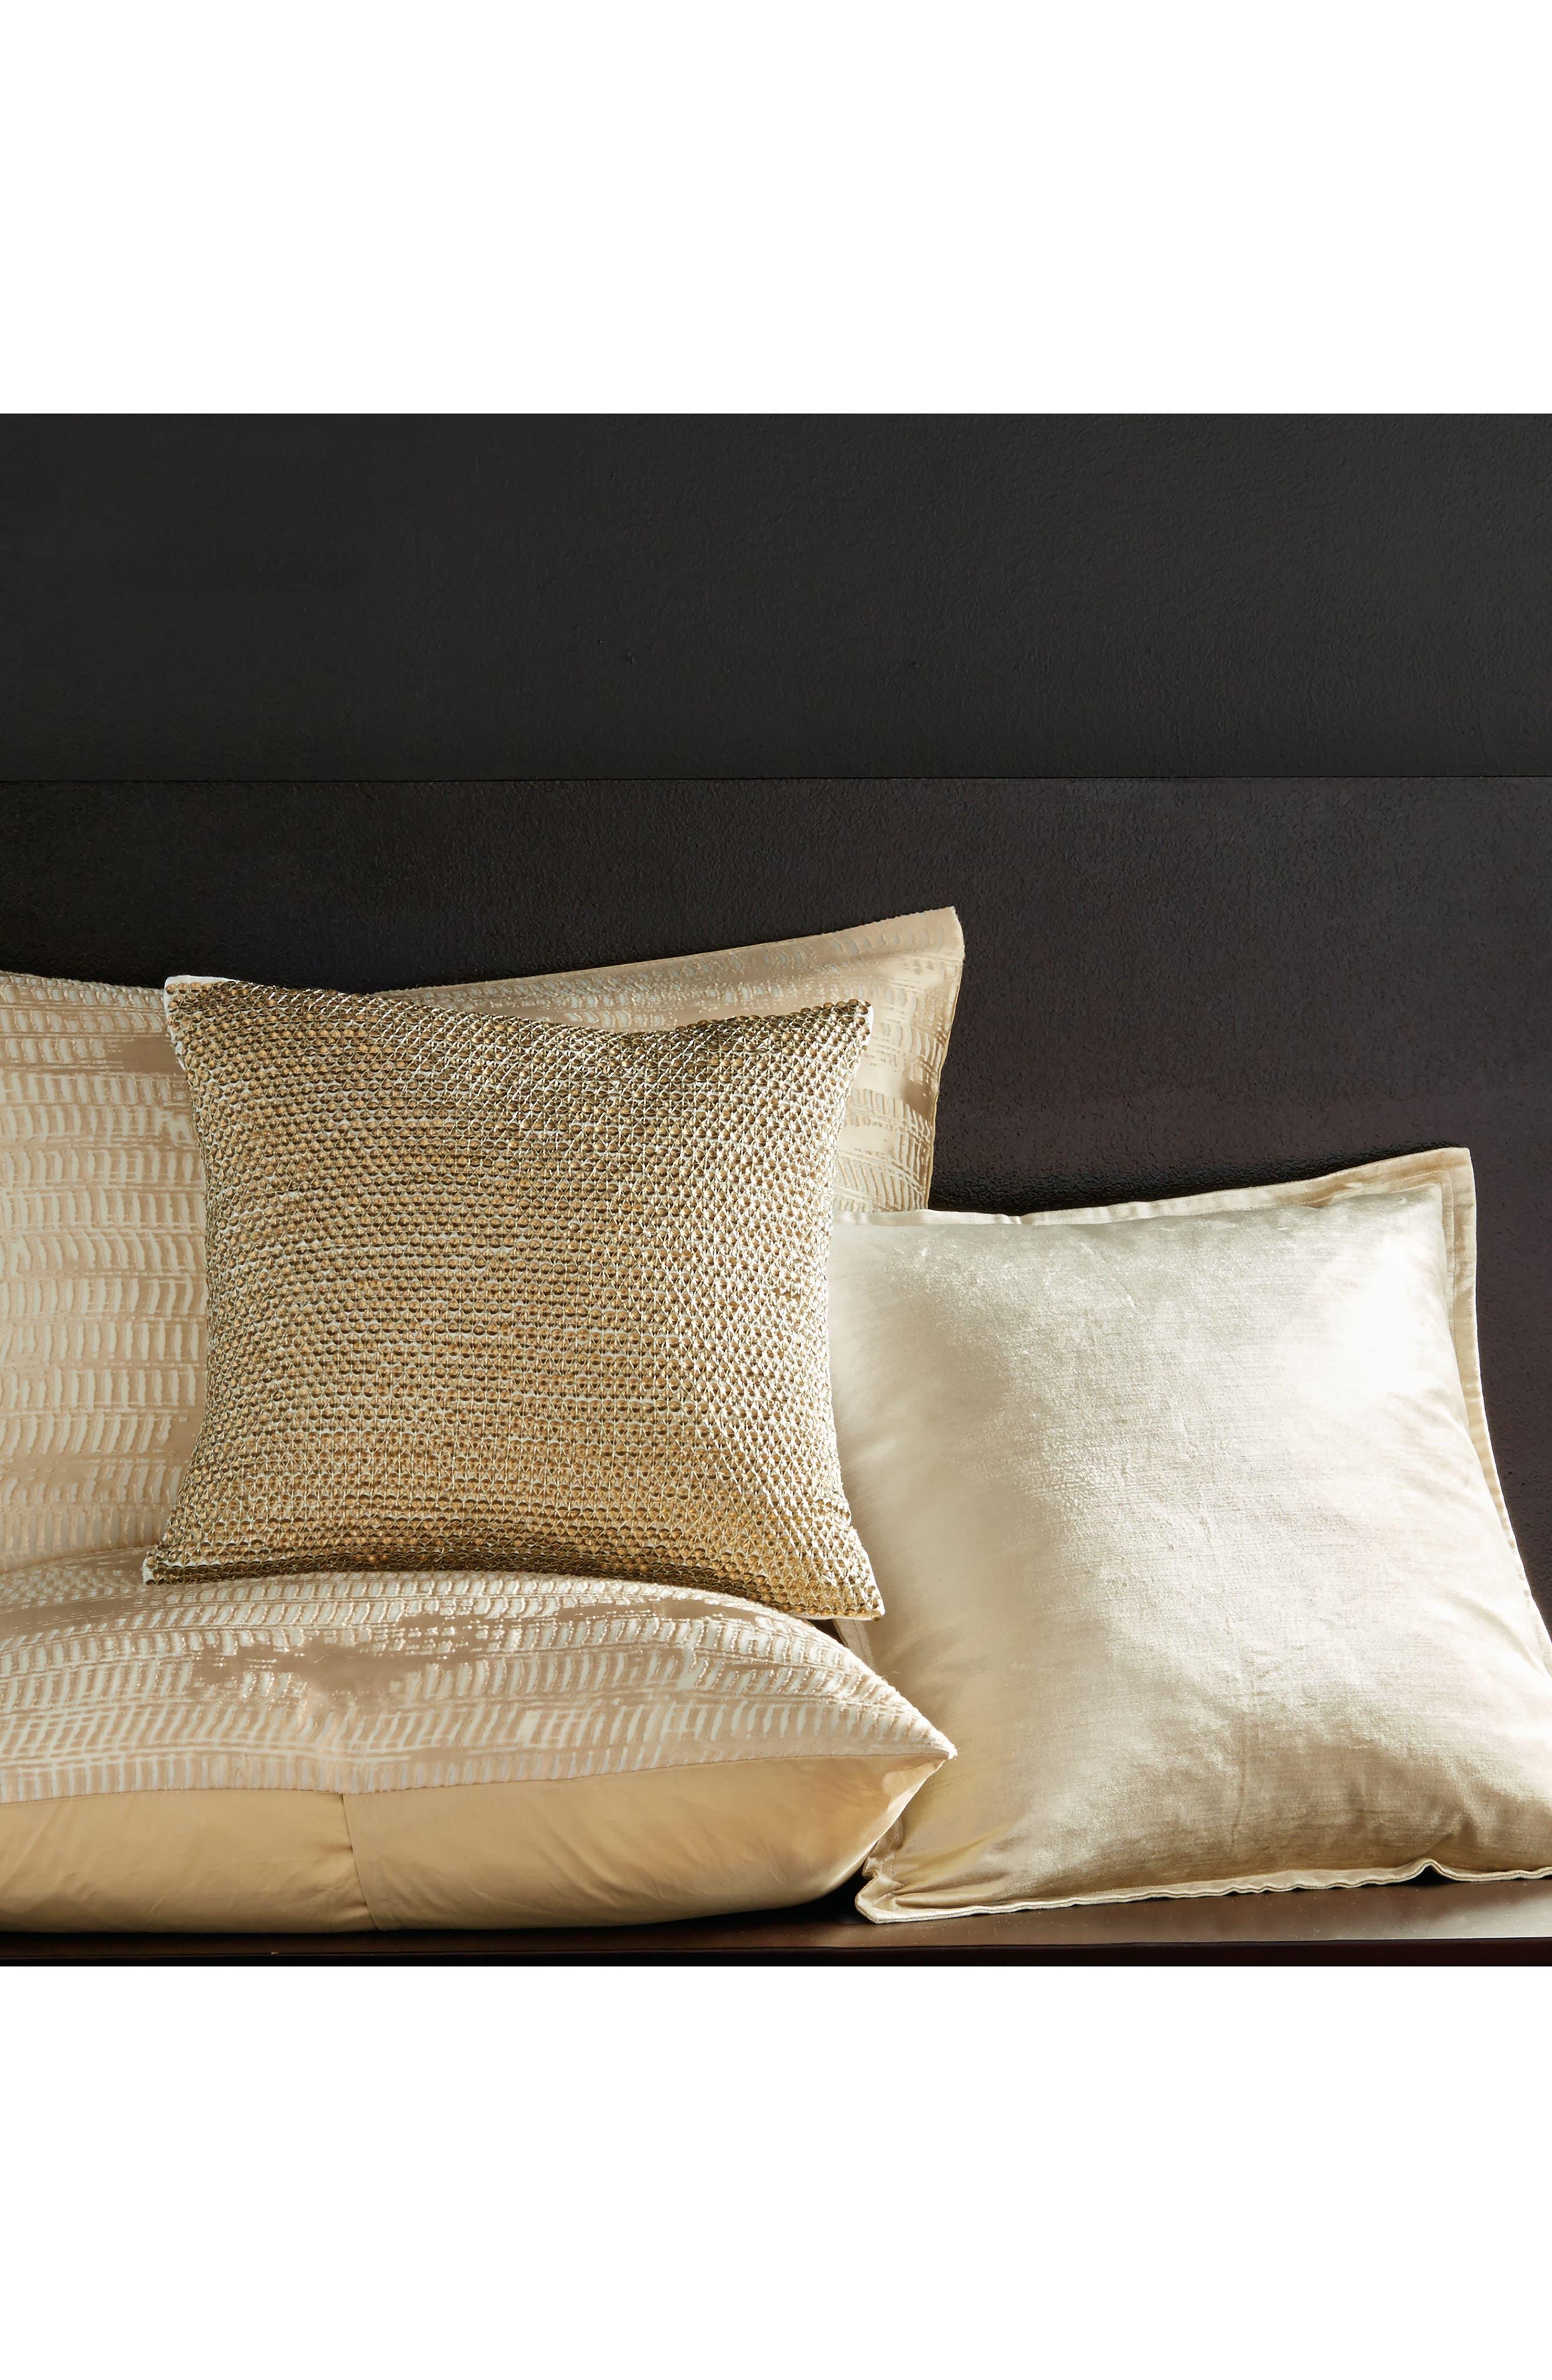 DONNA KARAN NEW YORK, Donna Karan Velvet Accent Pillow, Alternate thumbnail 2, color, GOLD DUST